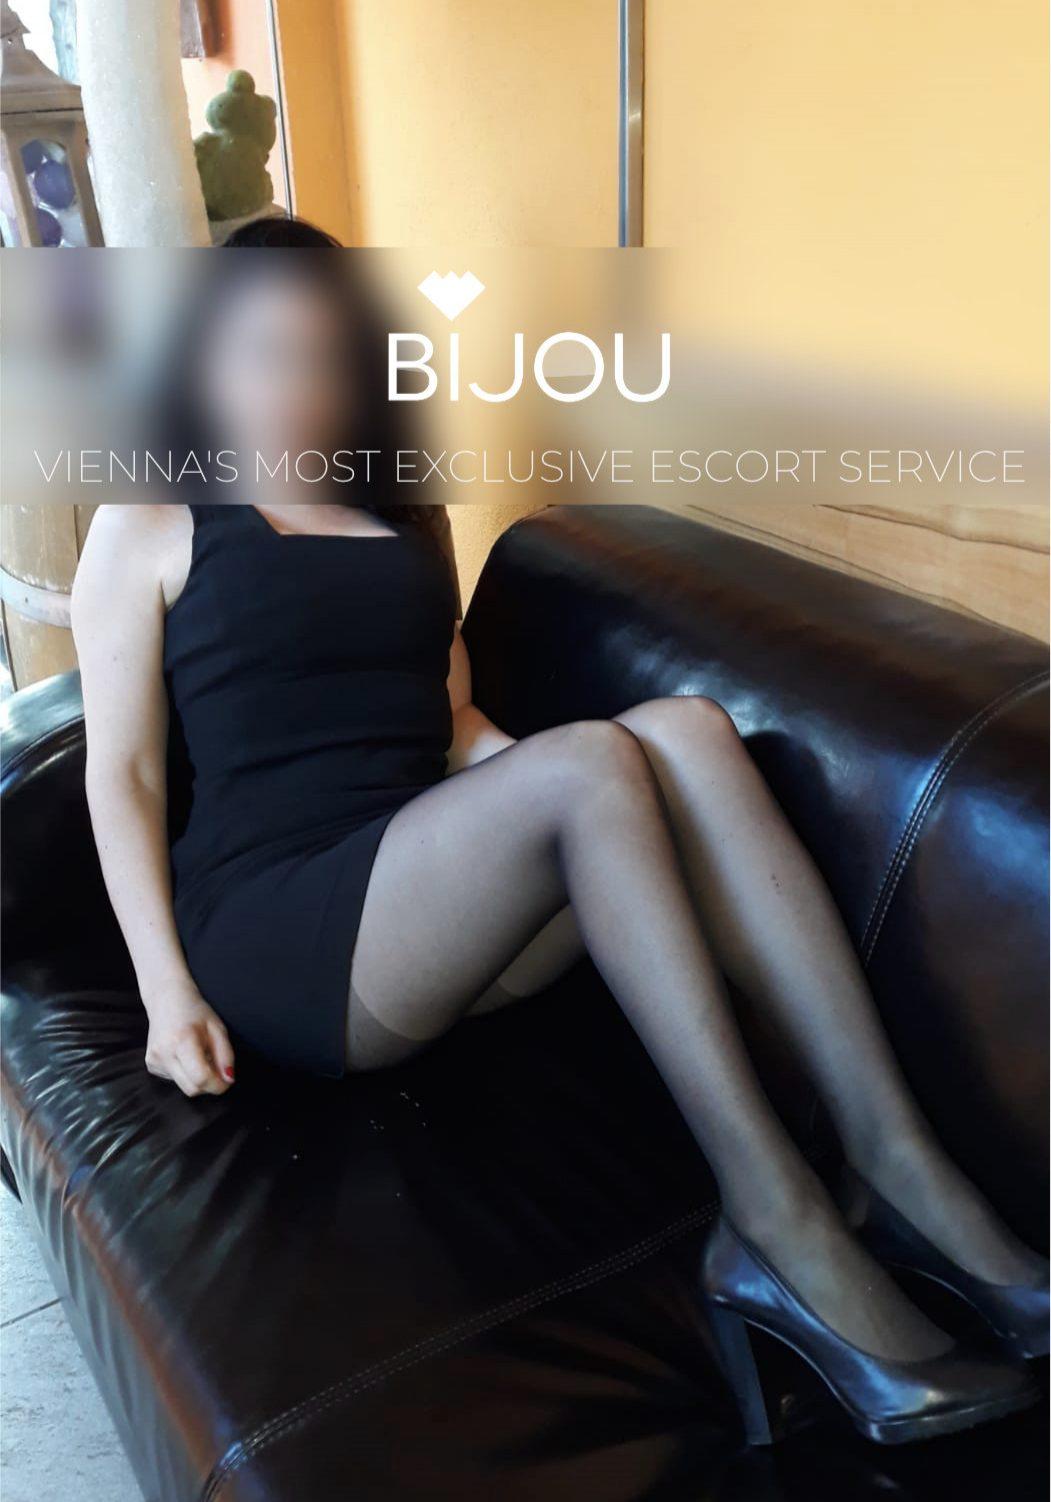 Bijou 2